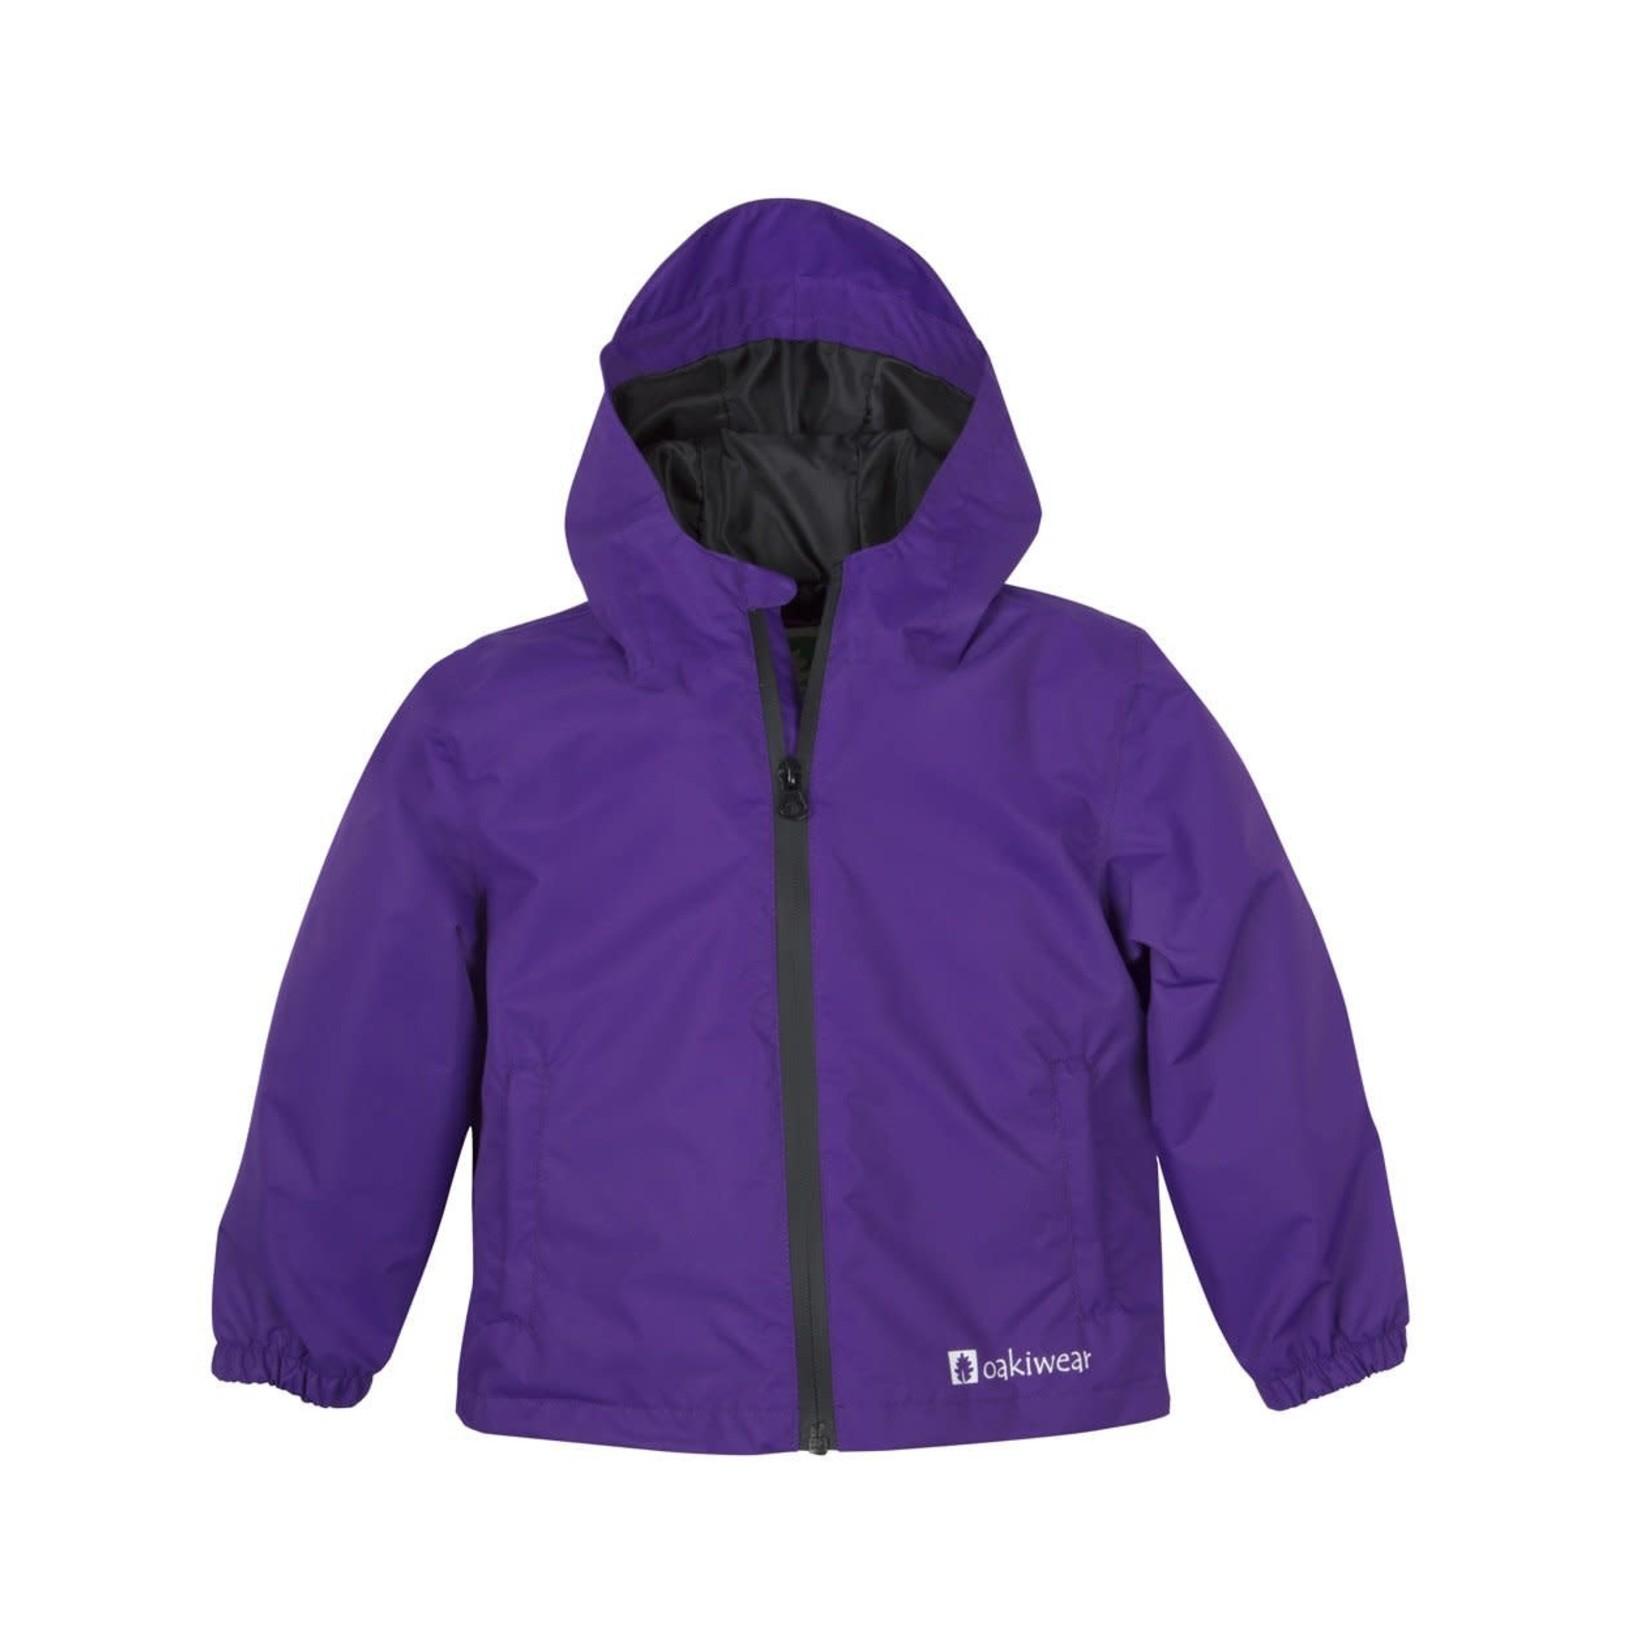 Oaki Wear Oaki Core Rain Jacket